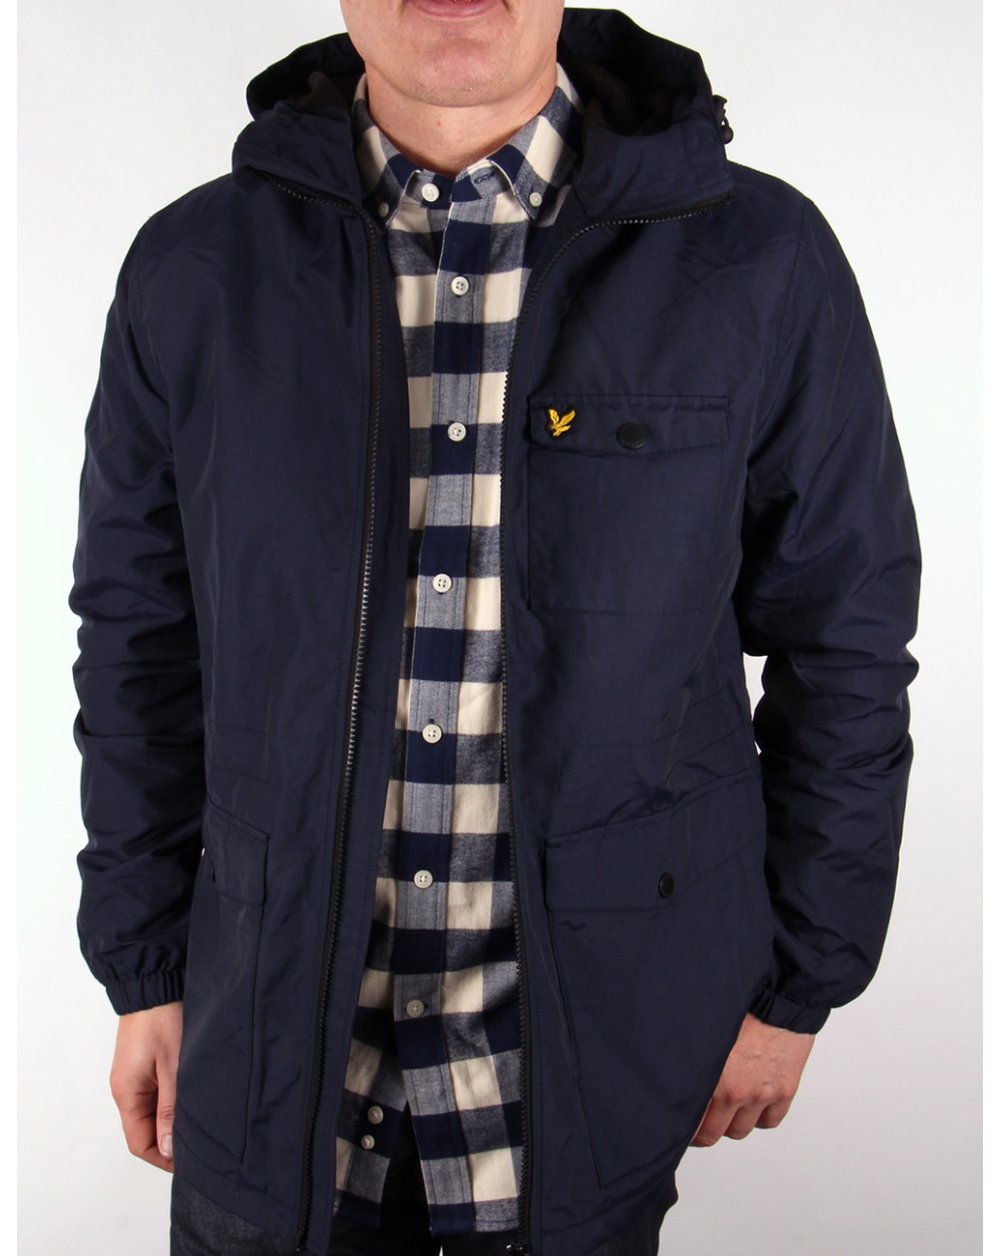 lyle and scott microfleece lined jacket navy parka coat mens. Black Bedroom Furniture Sets. Home Design Ideas